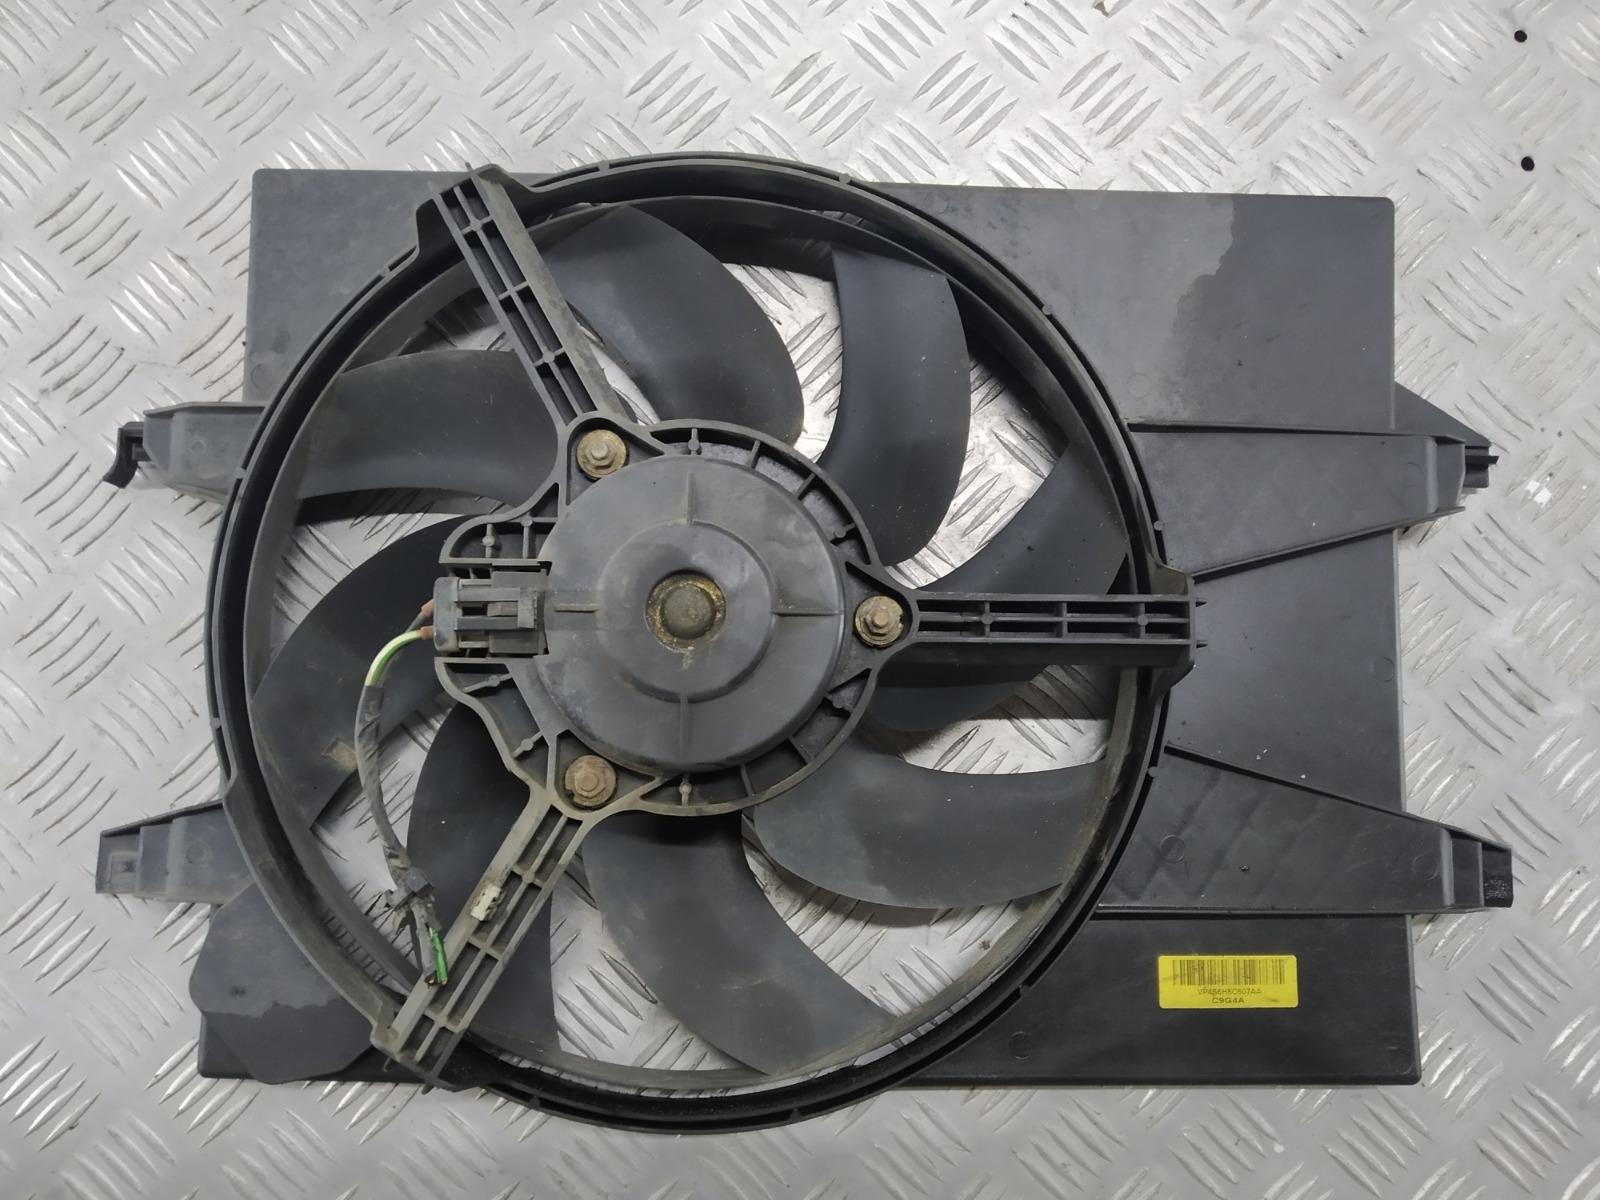 Вентилятор радиатора Ford Fusion 1.4 I 2004 (б/у)